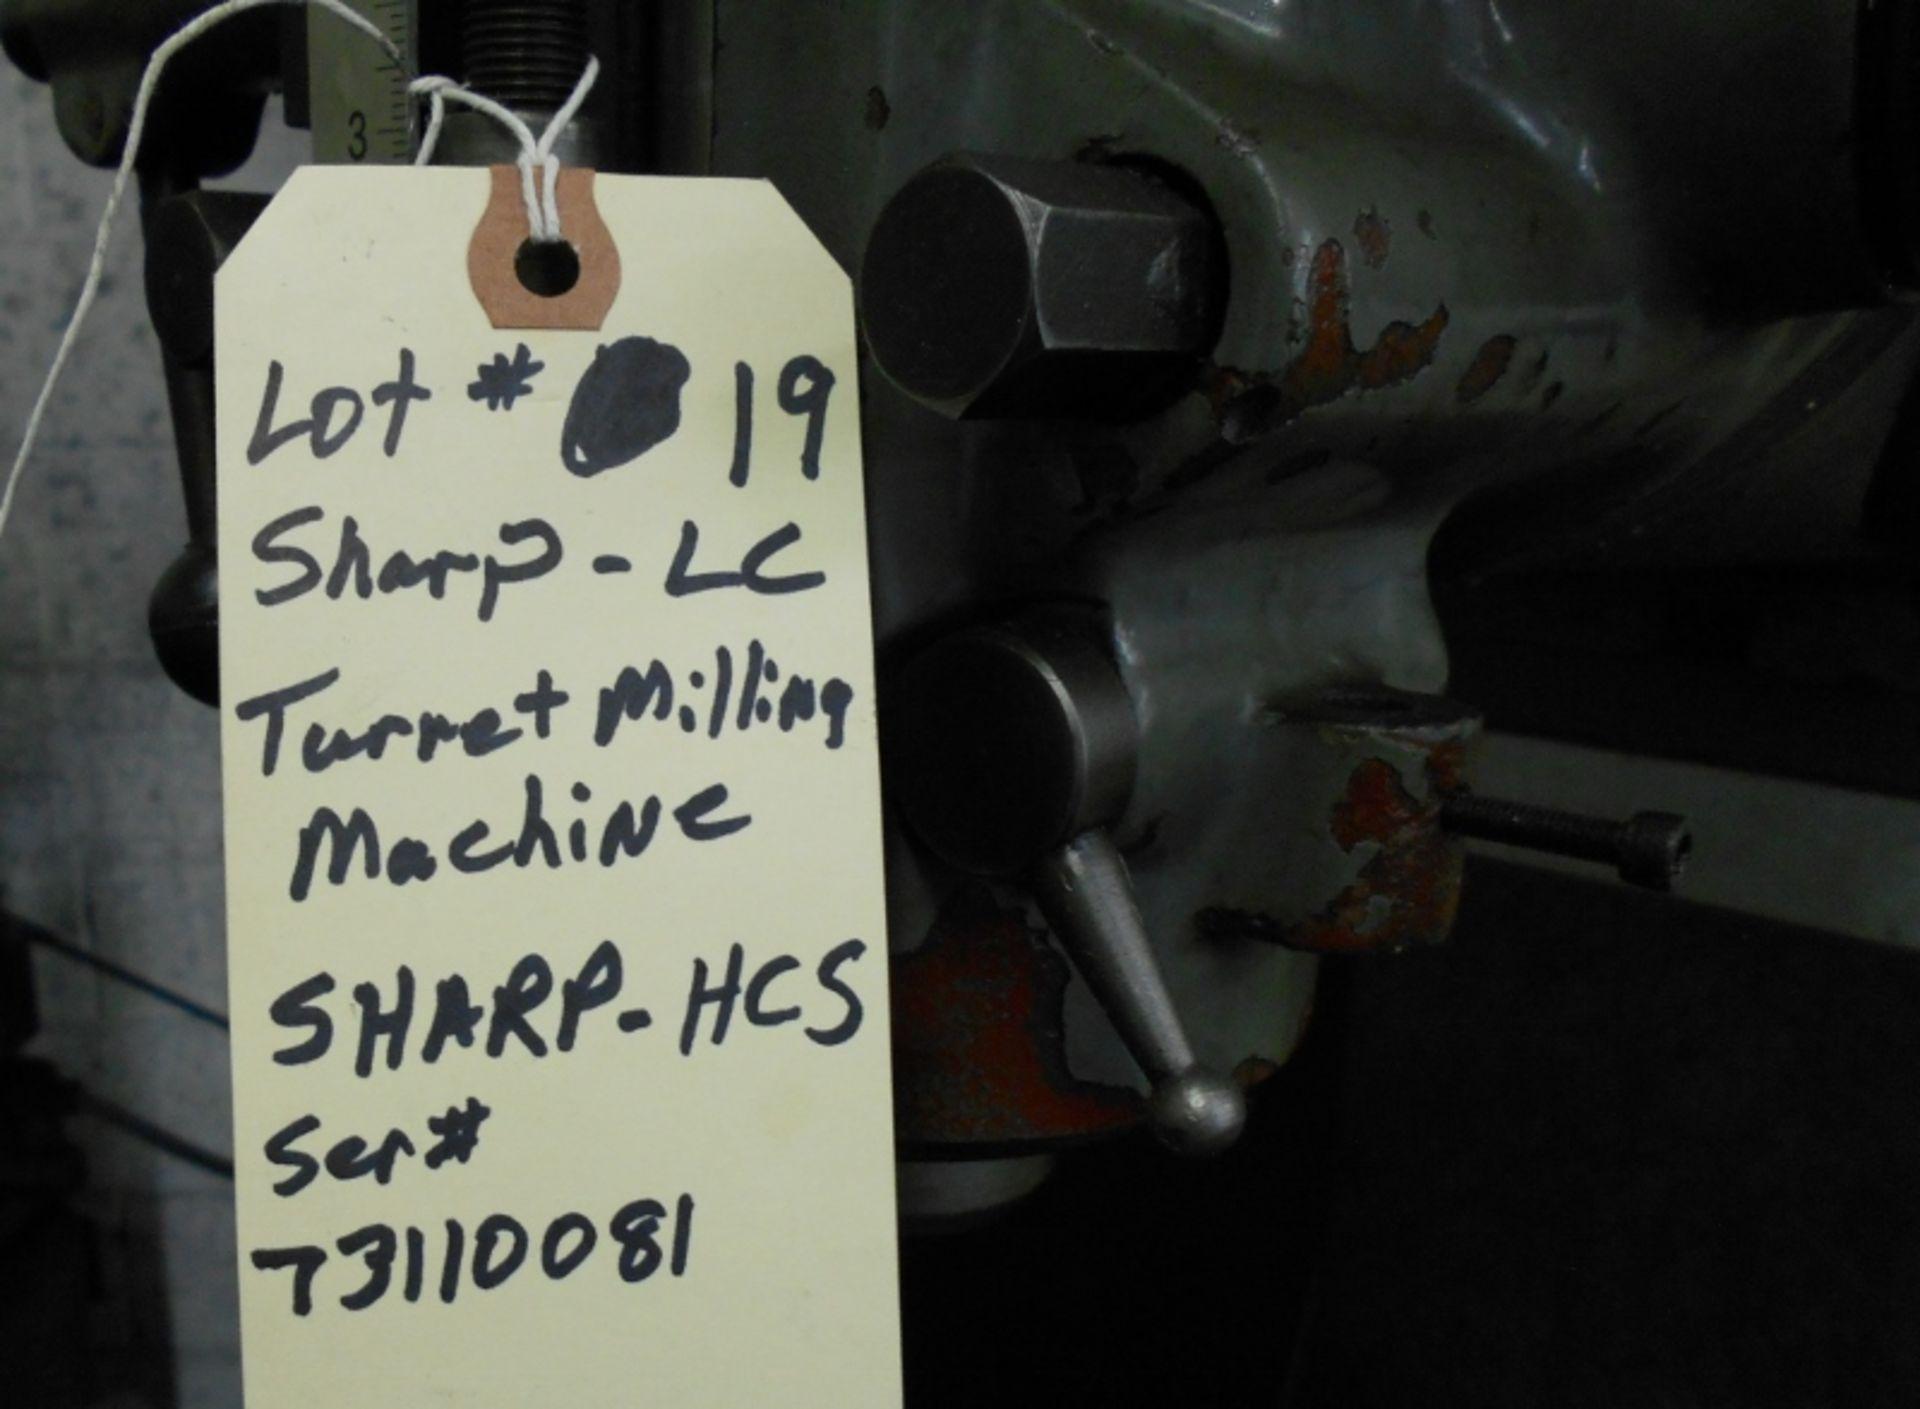 Lot 19 - Sharp Turret Milling Machine Model #Sharp-HCS Serial #73110091